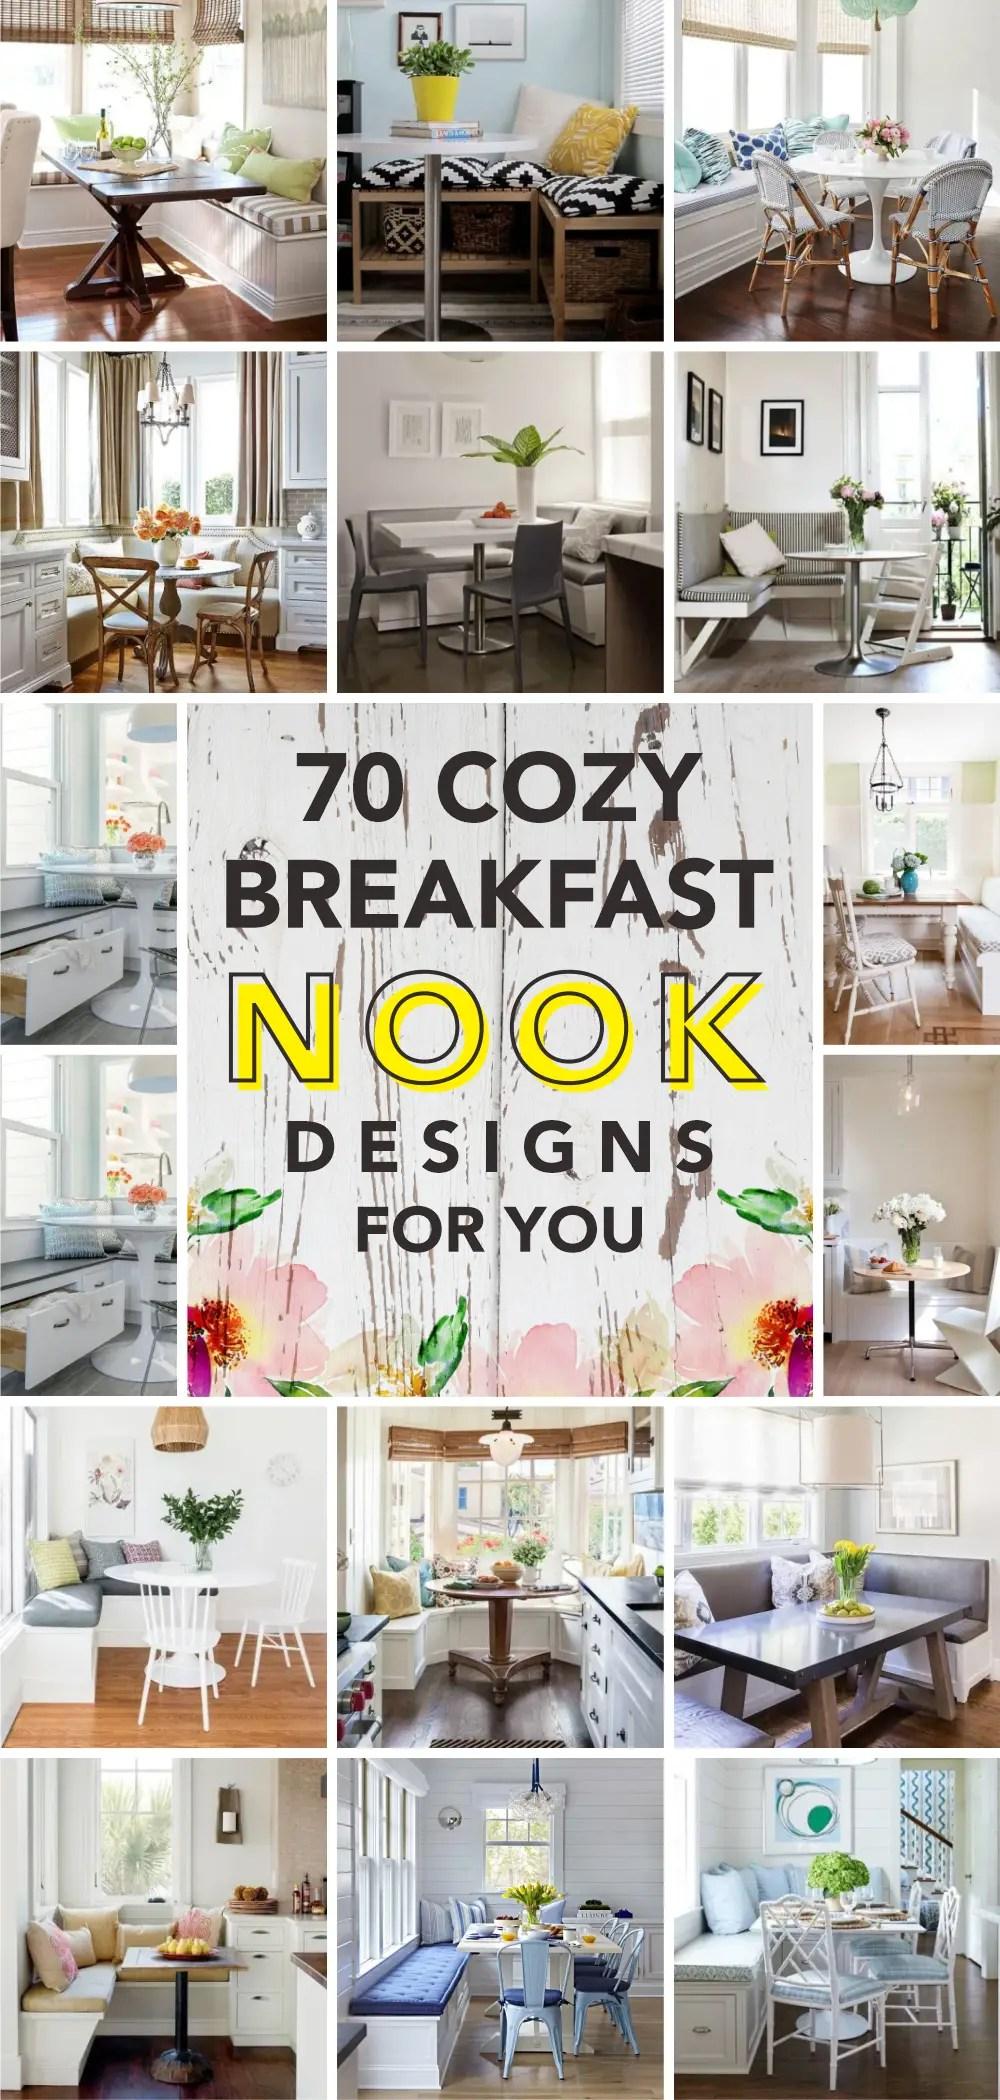 70-cozy-breakfast-nook-designs-for-you-1